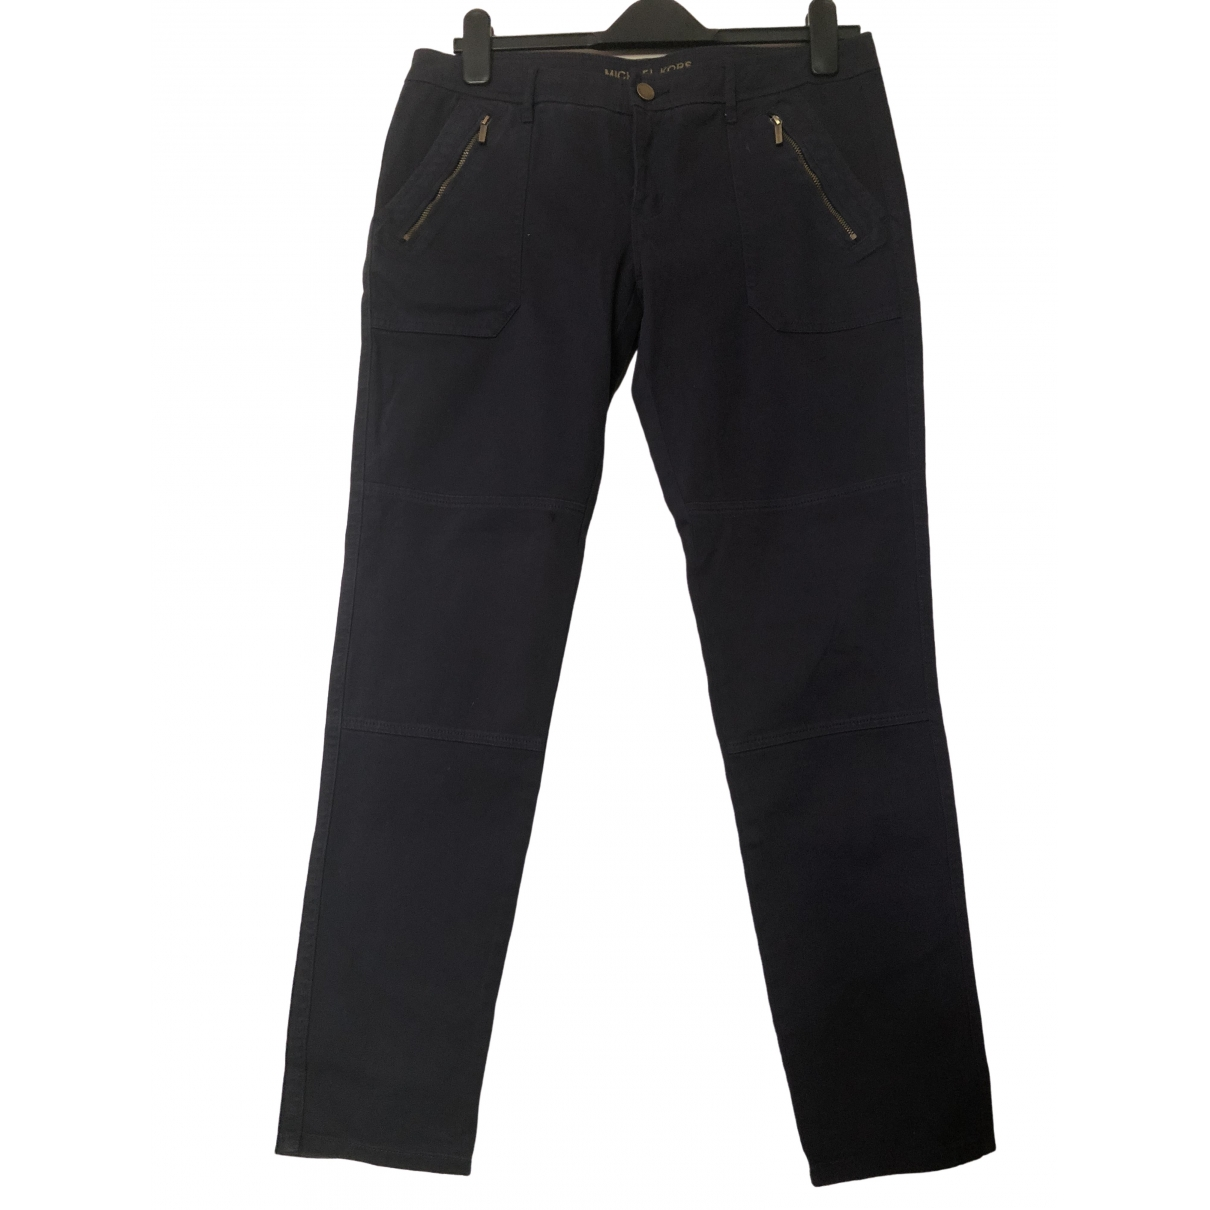 Michael Kors \N Navy Cotton Jeans for Women 28 US